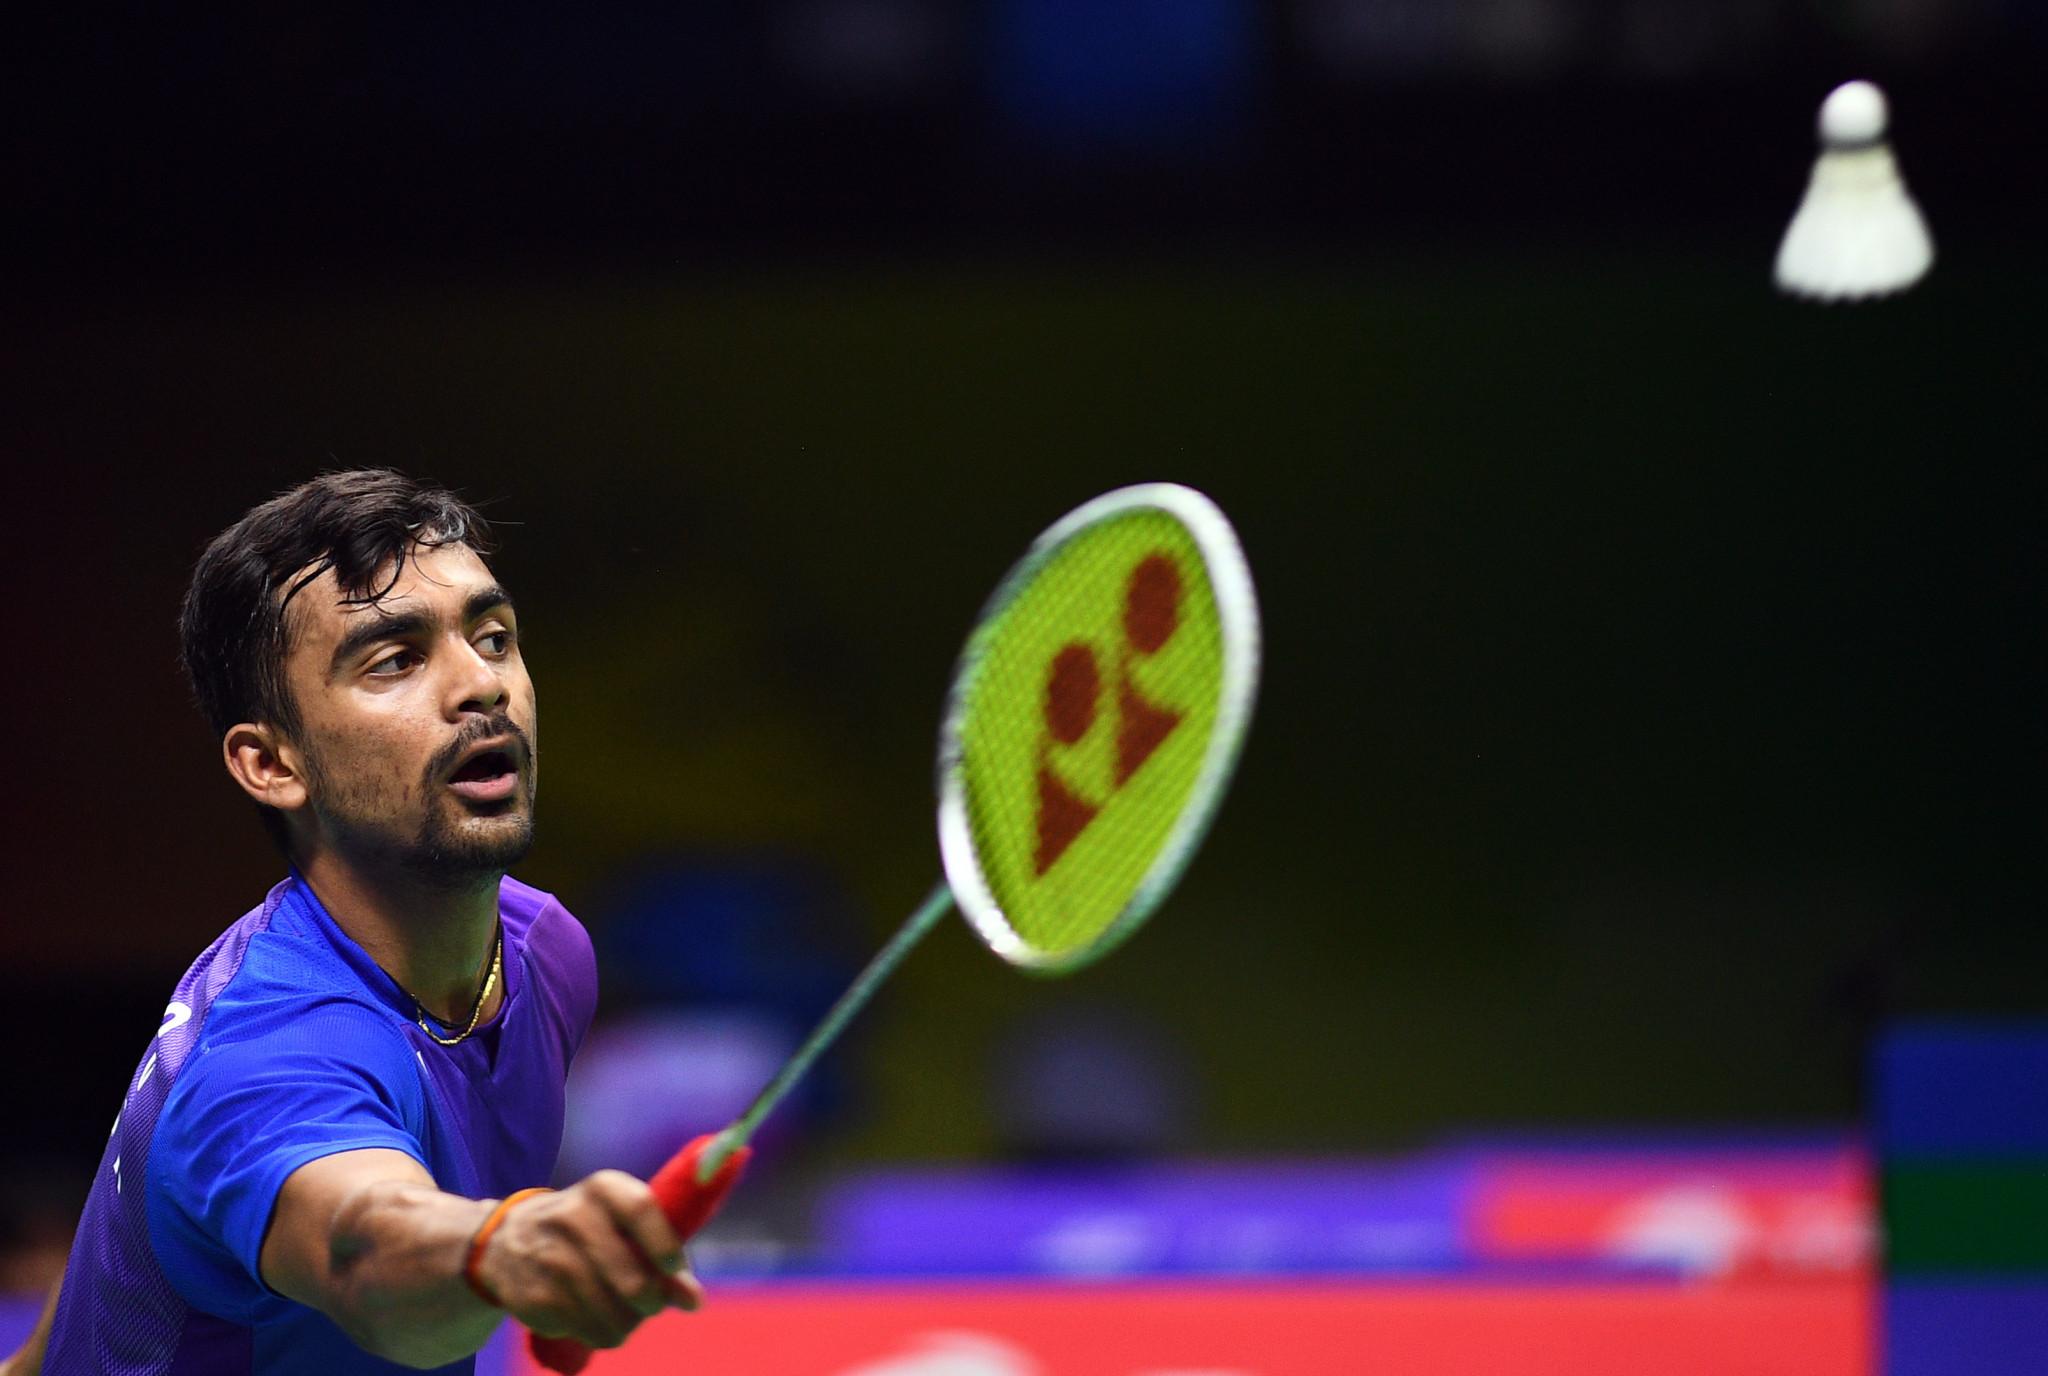 Sameer Verma progressed in the men's singles draw ©Getty Images